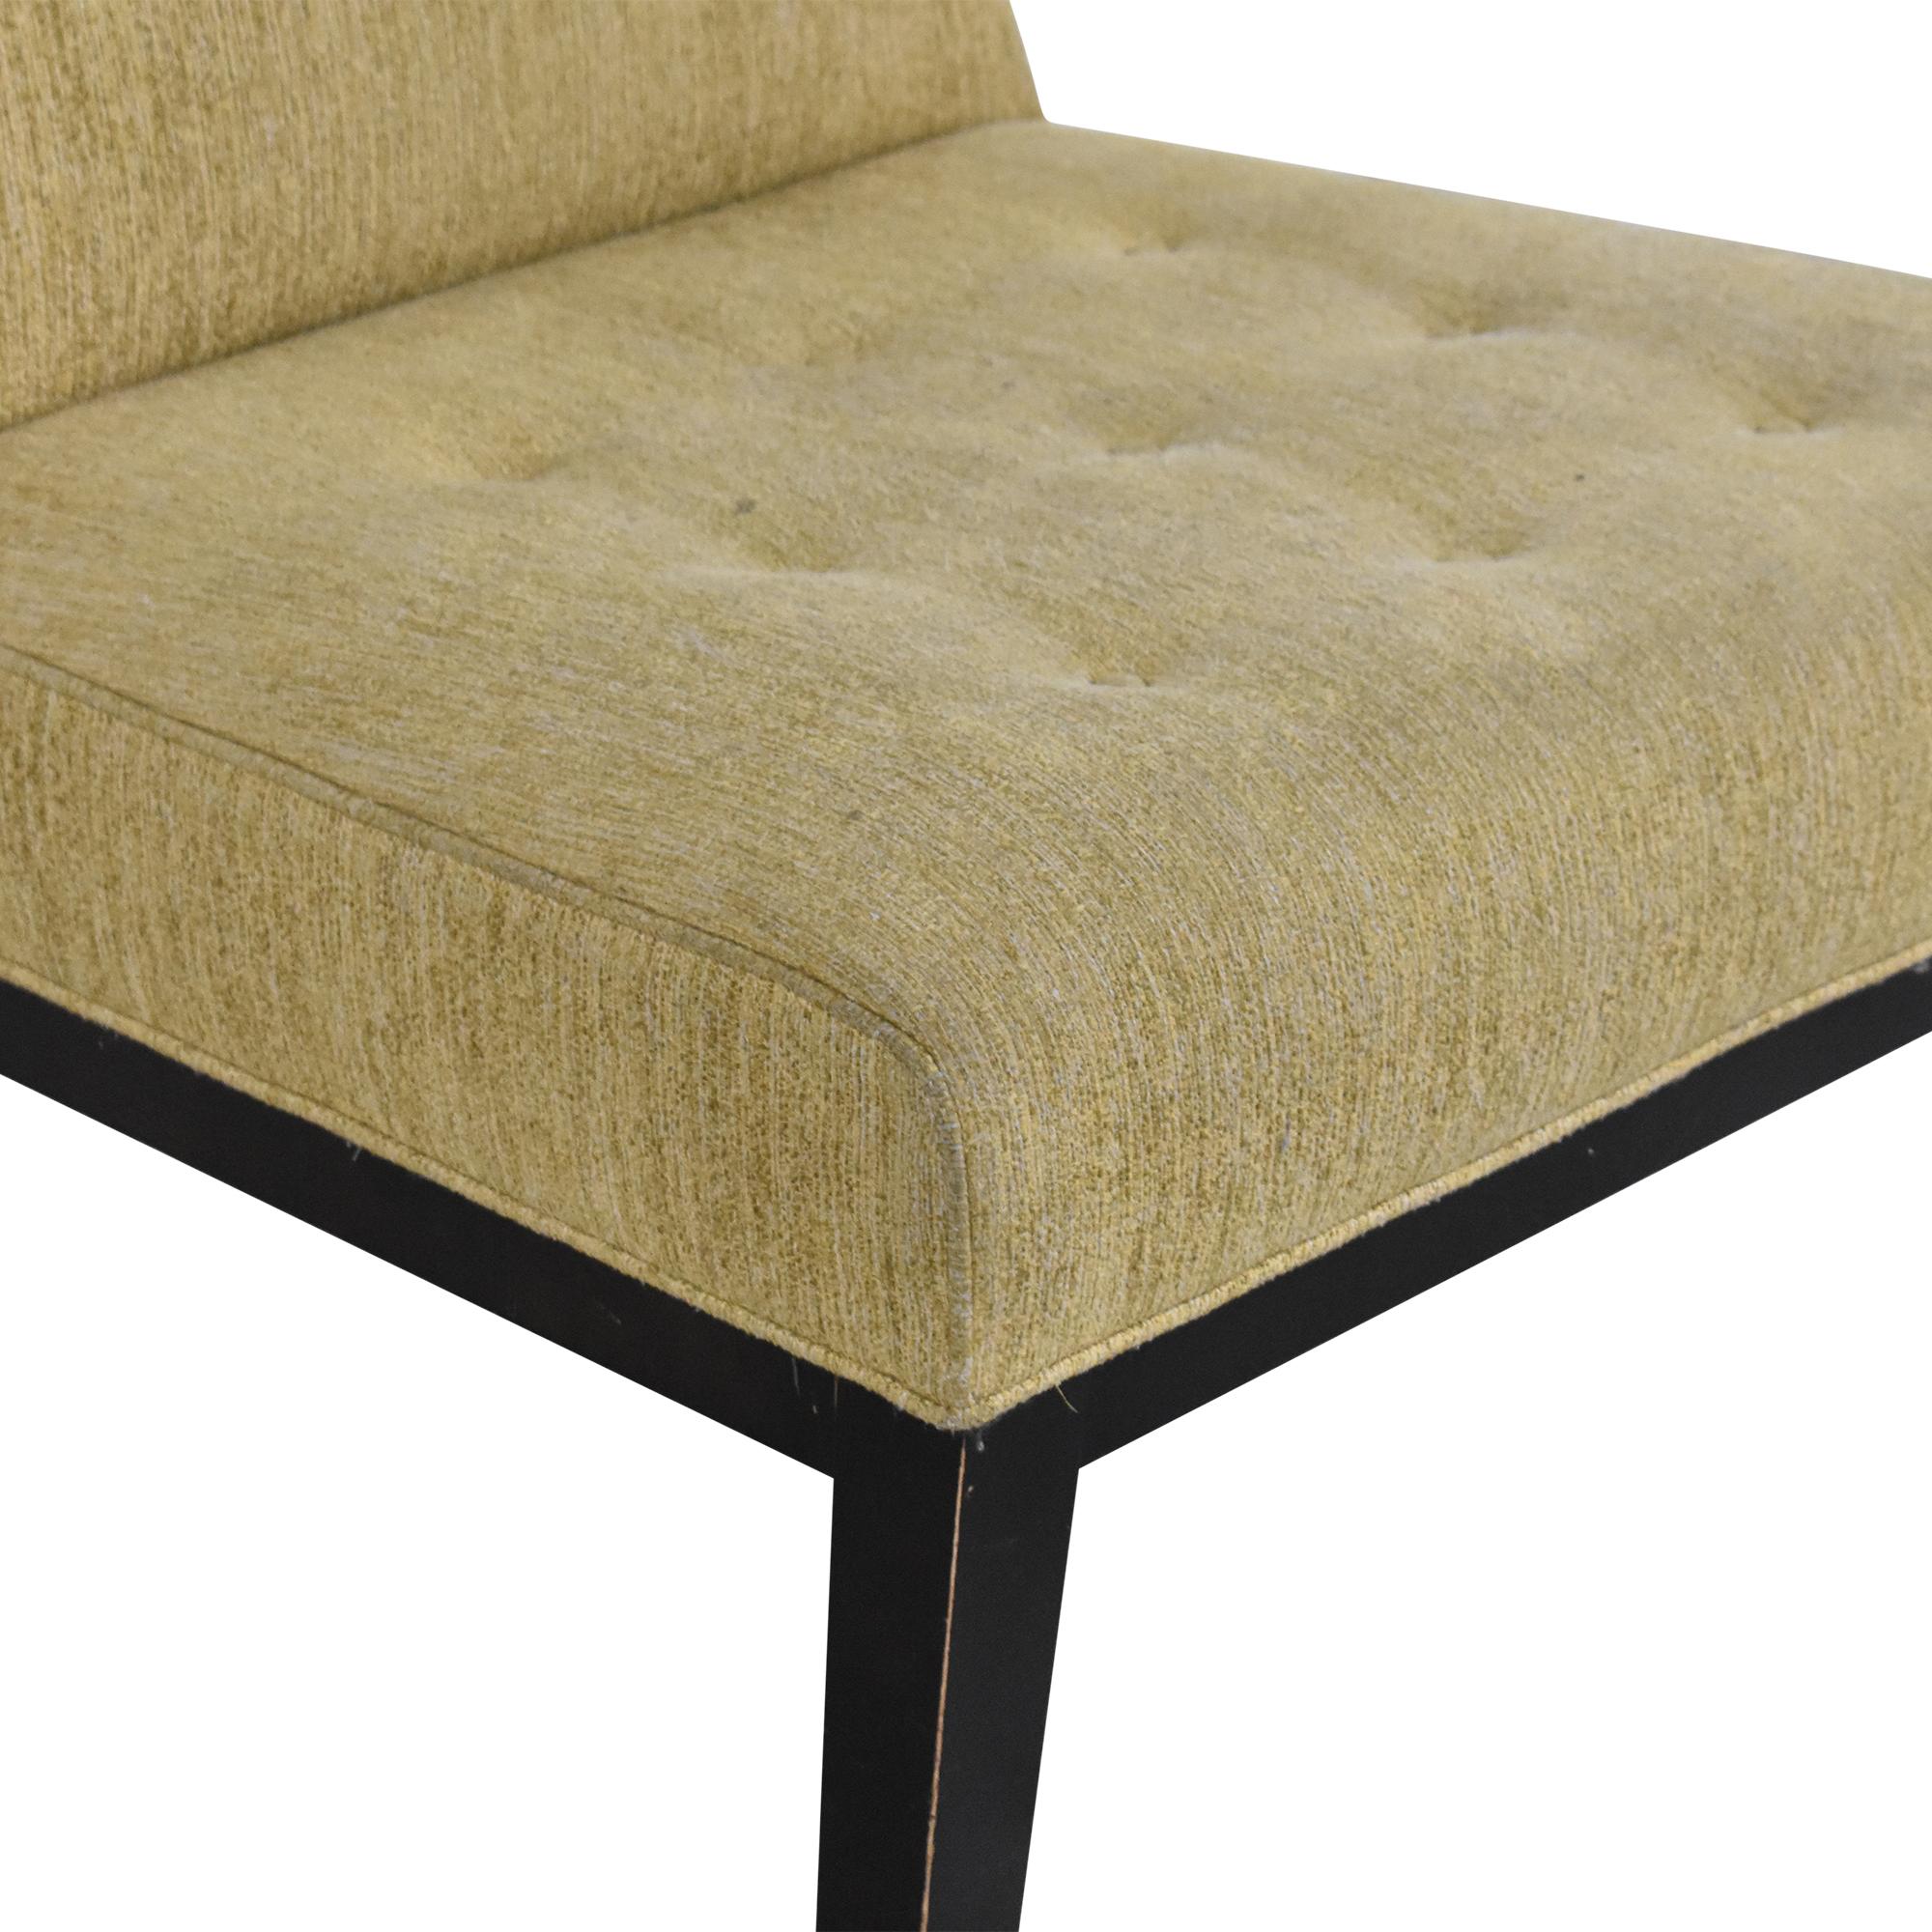 Room & Board Room & Board Tufted Slipper Chair dimensions